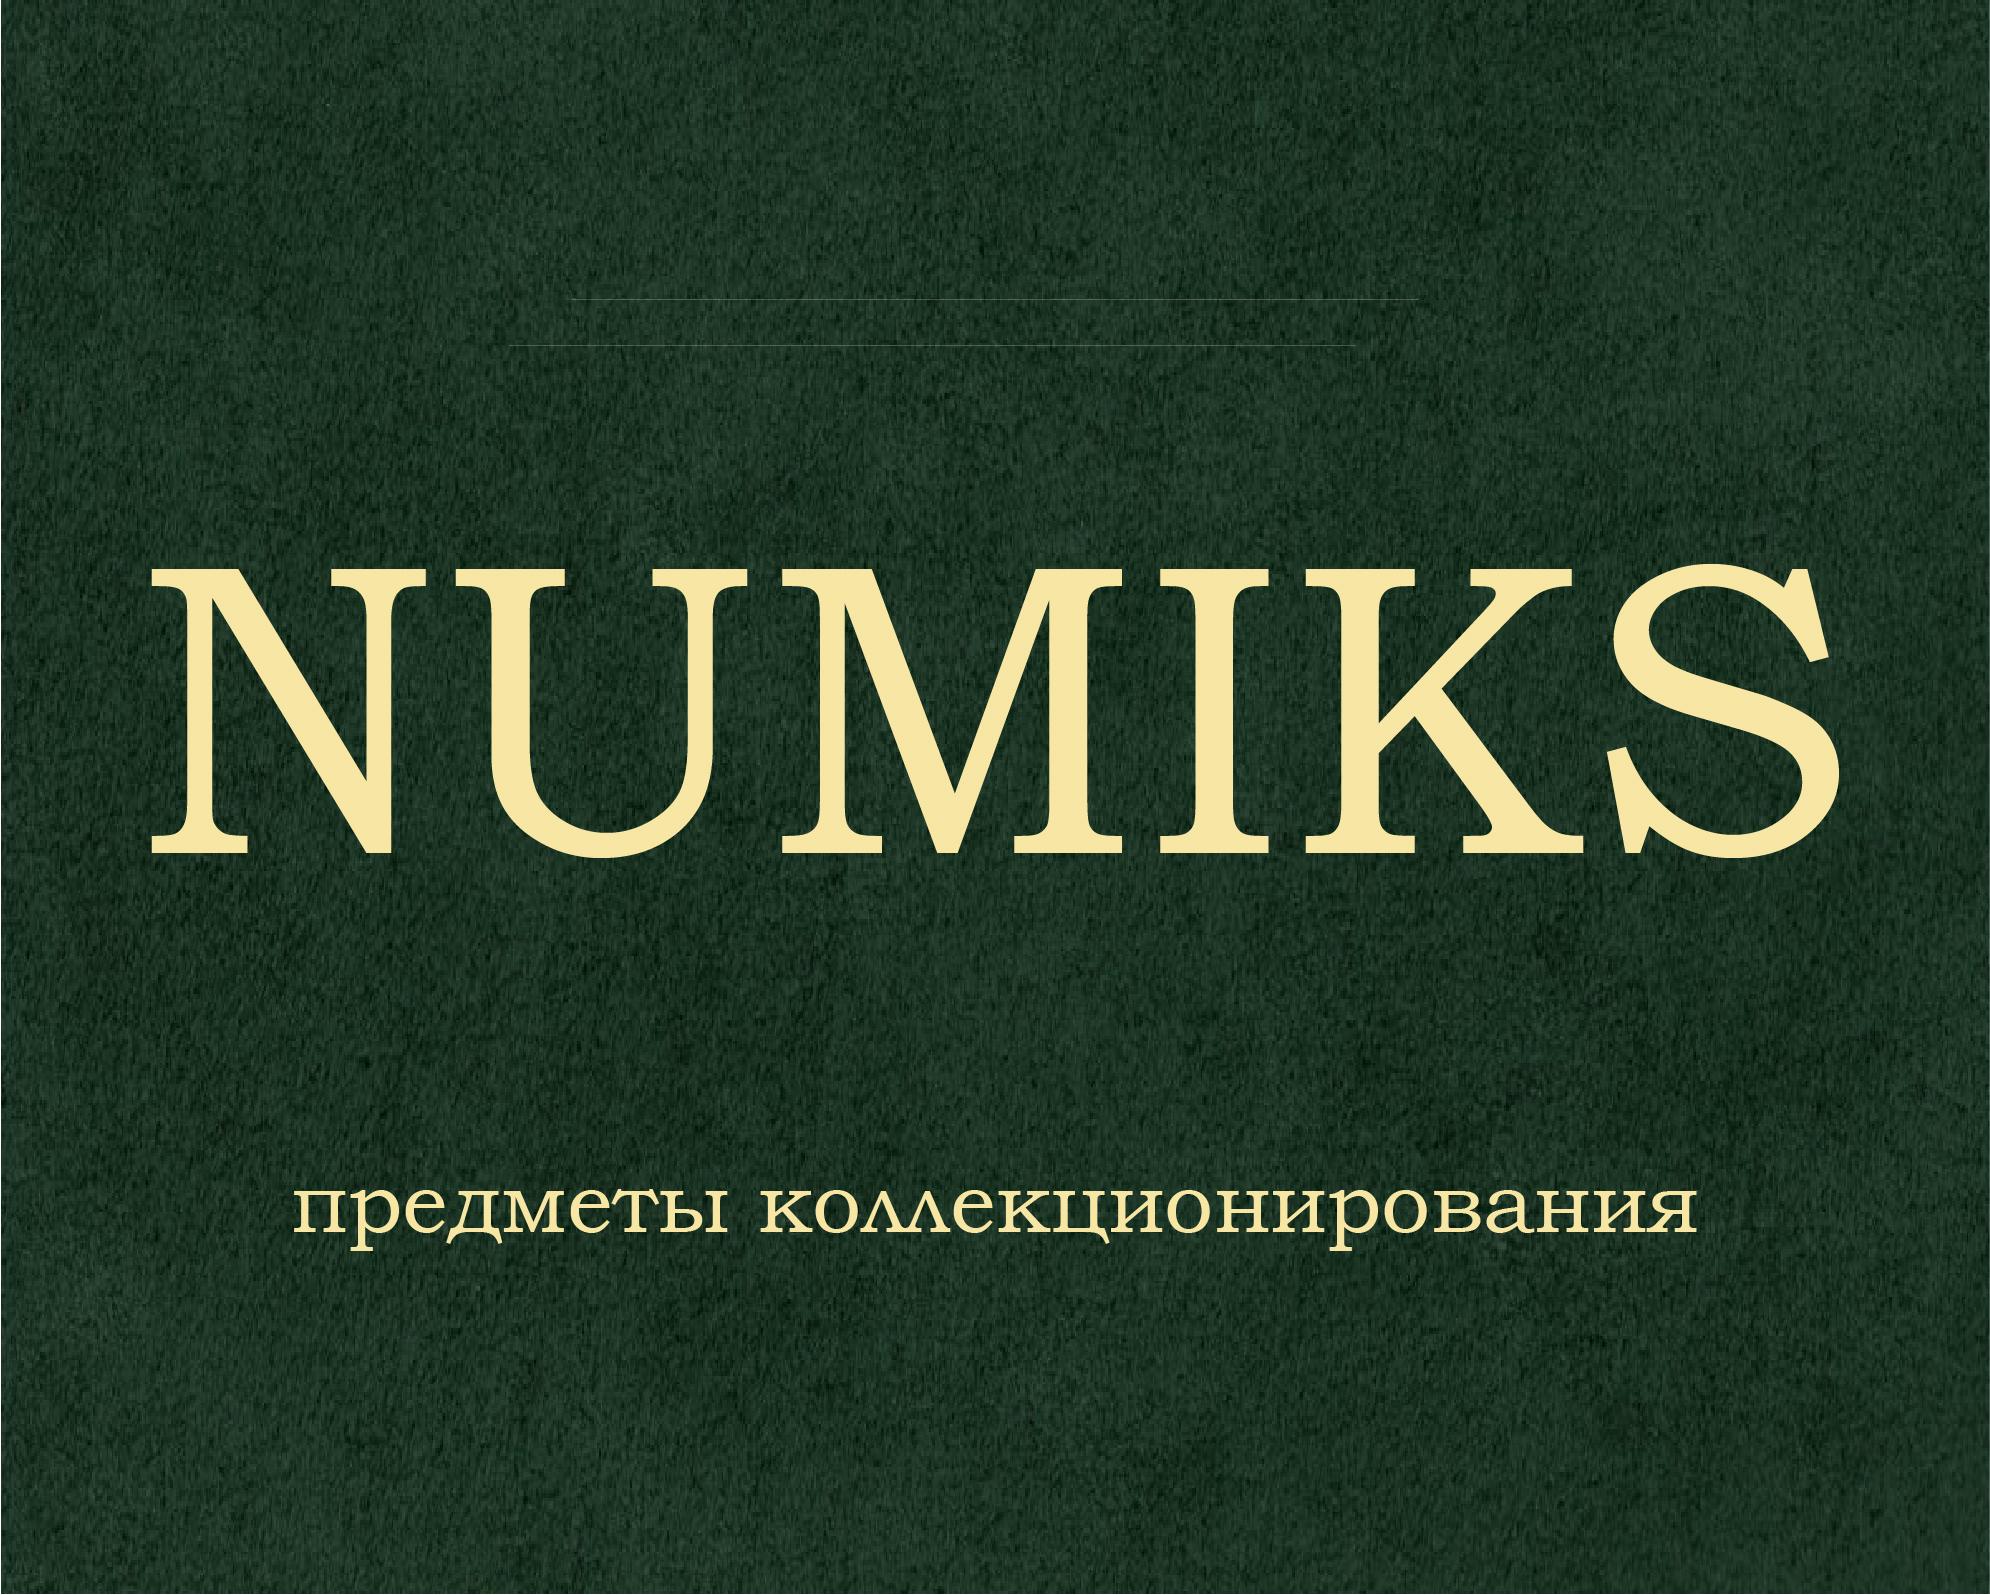 Логотип для интернет-магазина фото f_2385ec66c0b64daf.jpg